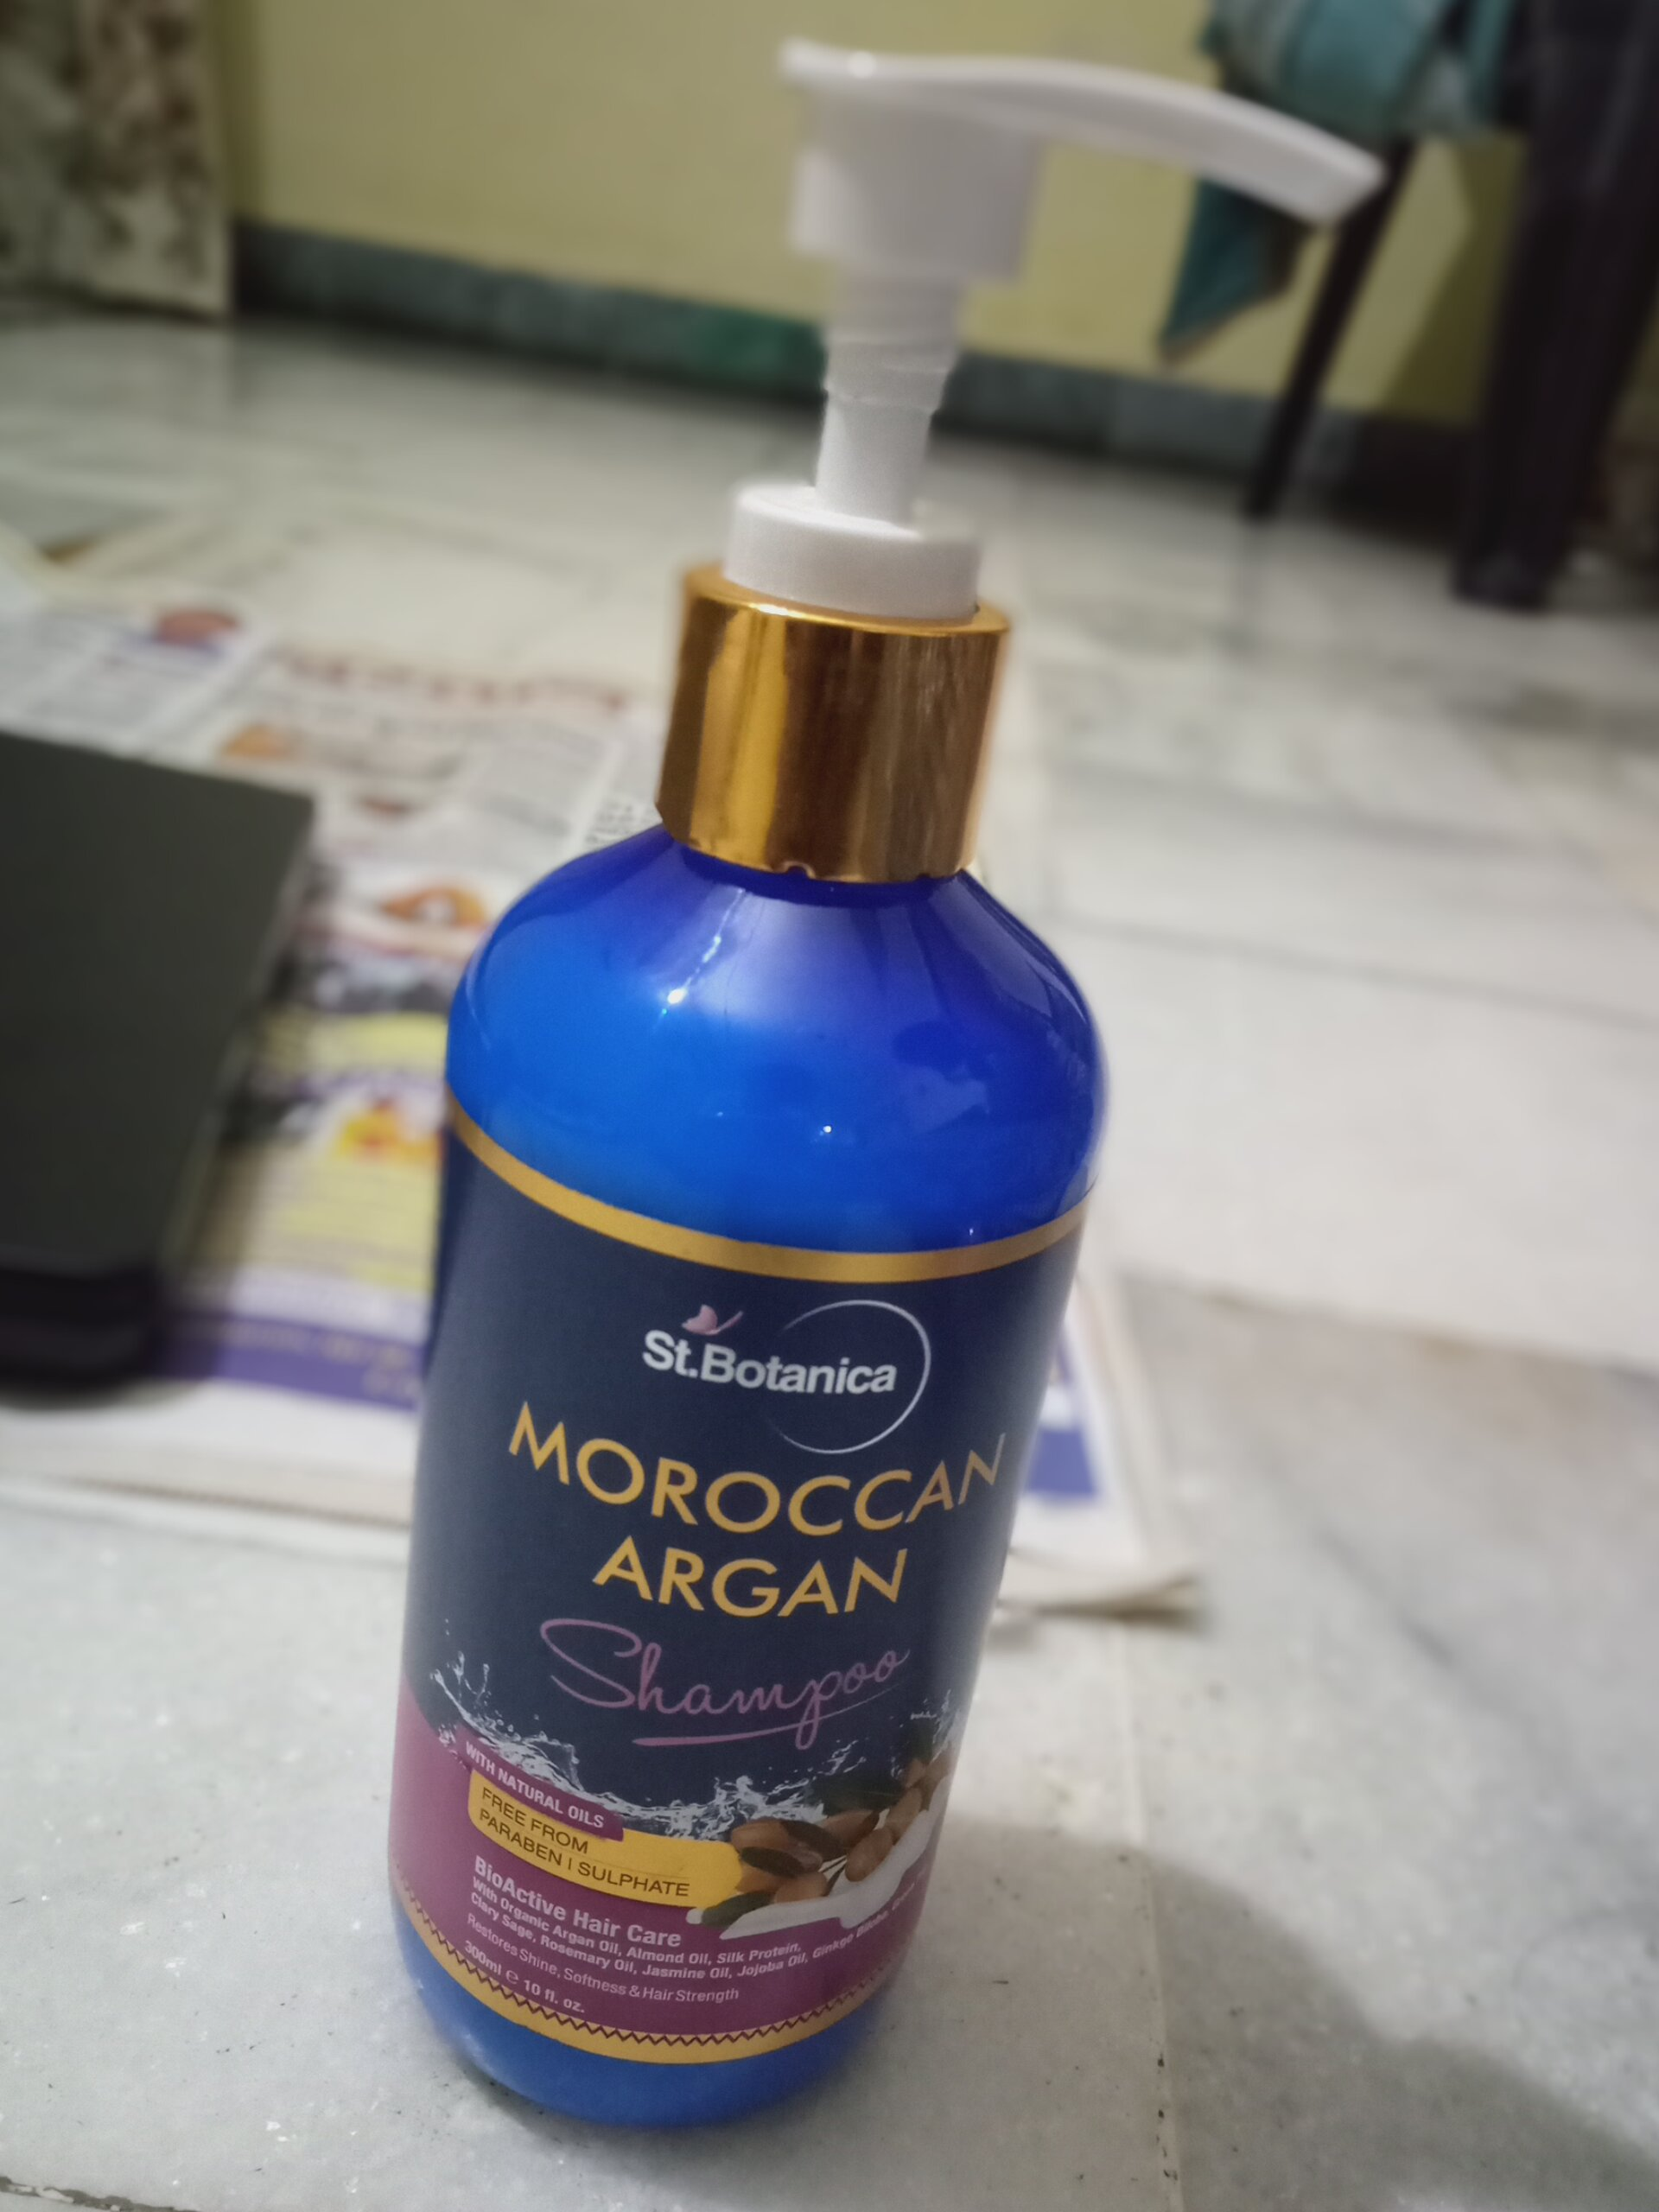 StBotanica Moroccan Argan Hair Shampoo-Really Effective-By aditya_kumar_gupta-3